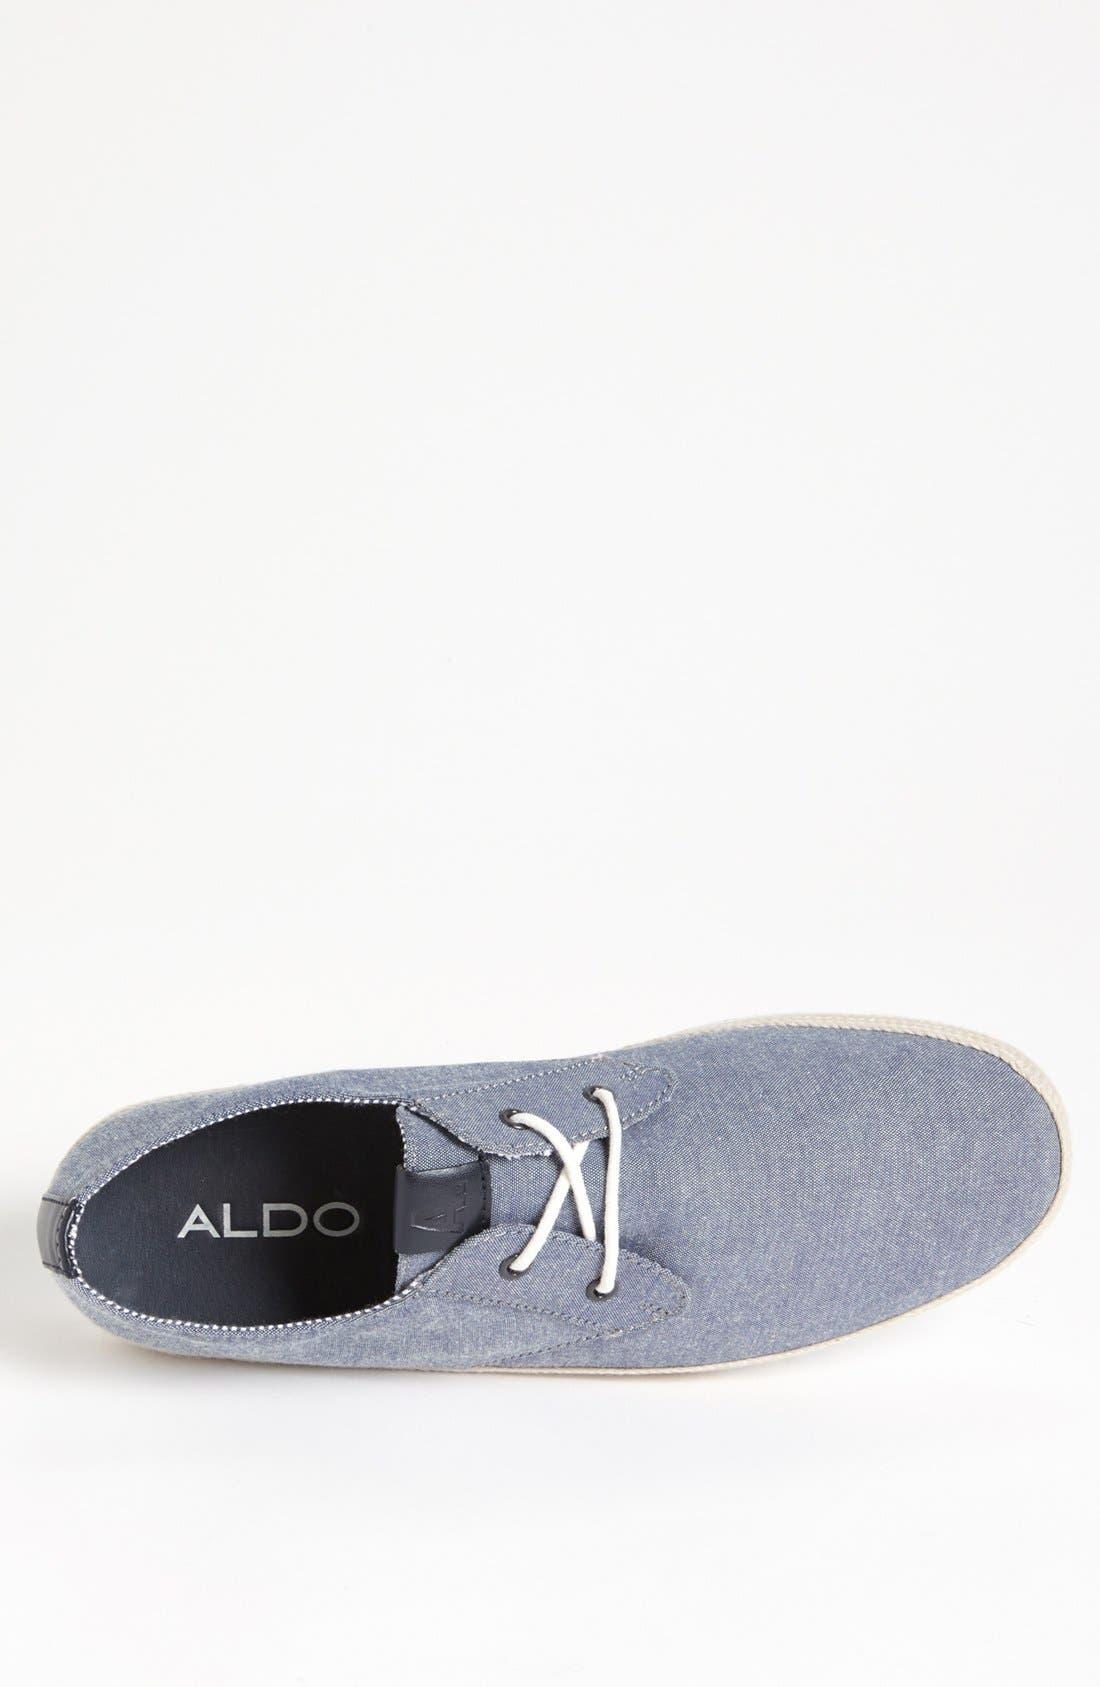 Alternate Image 3  - ALDO 'Stein' Sneaker